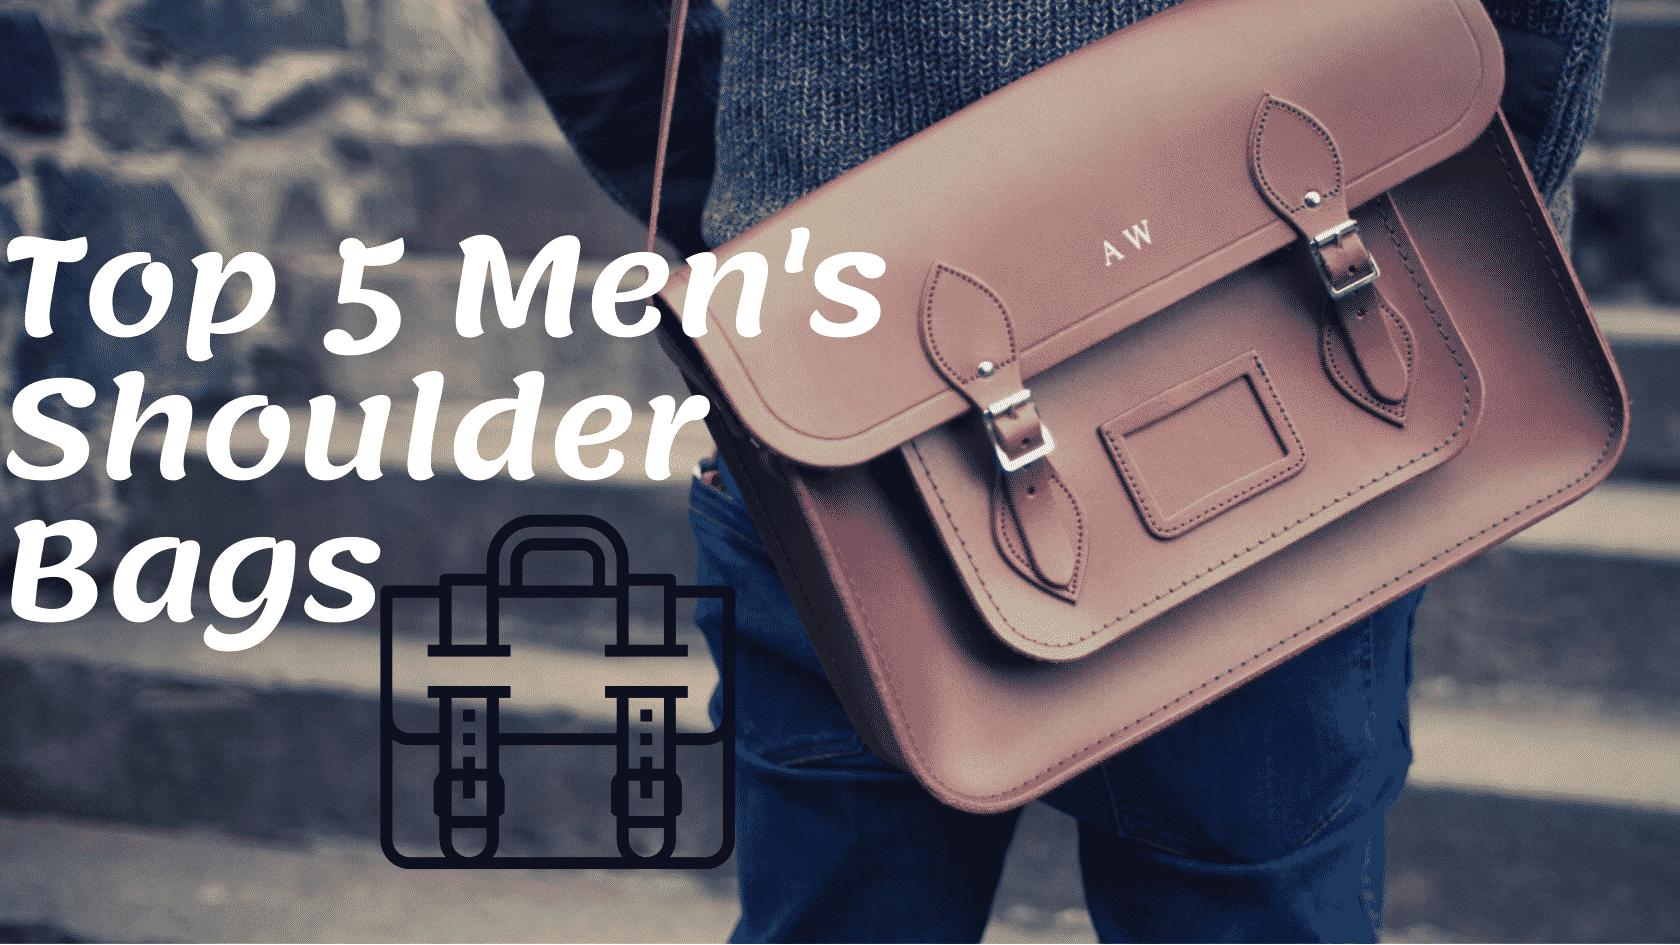 Top 5 Men's Shoulder Bags